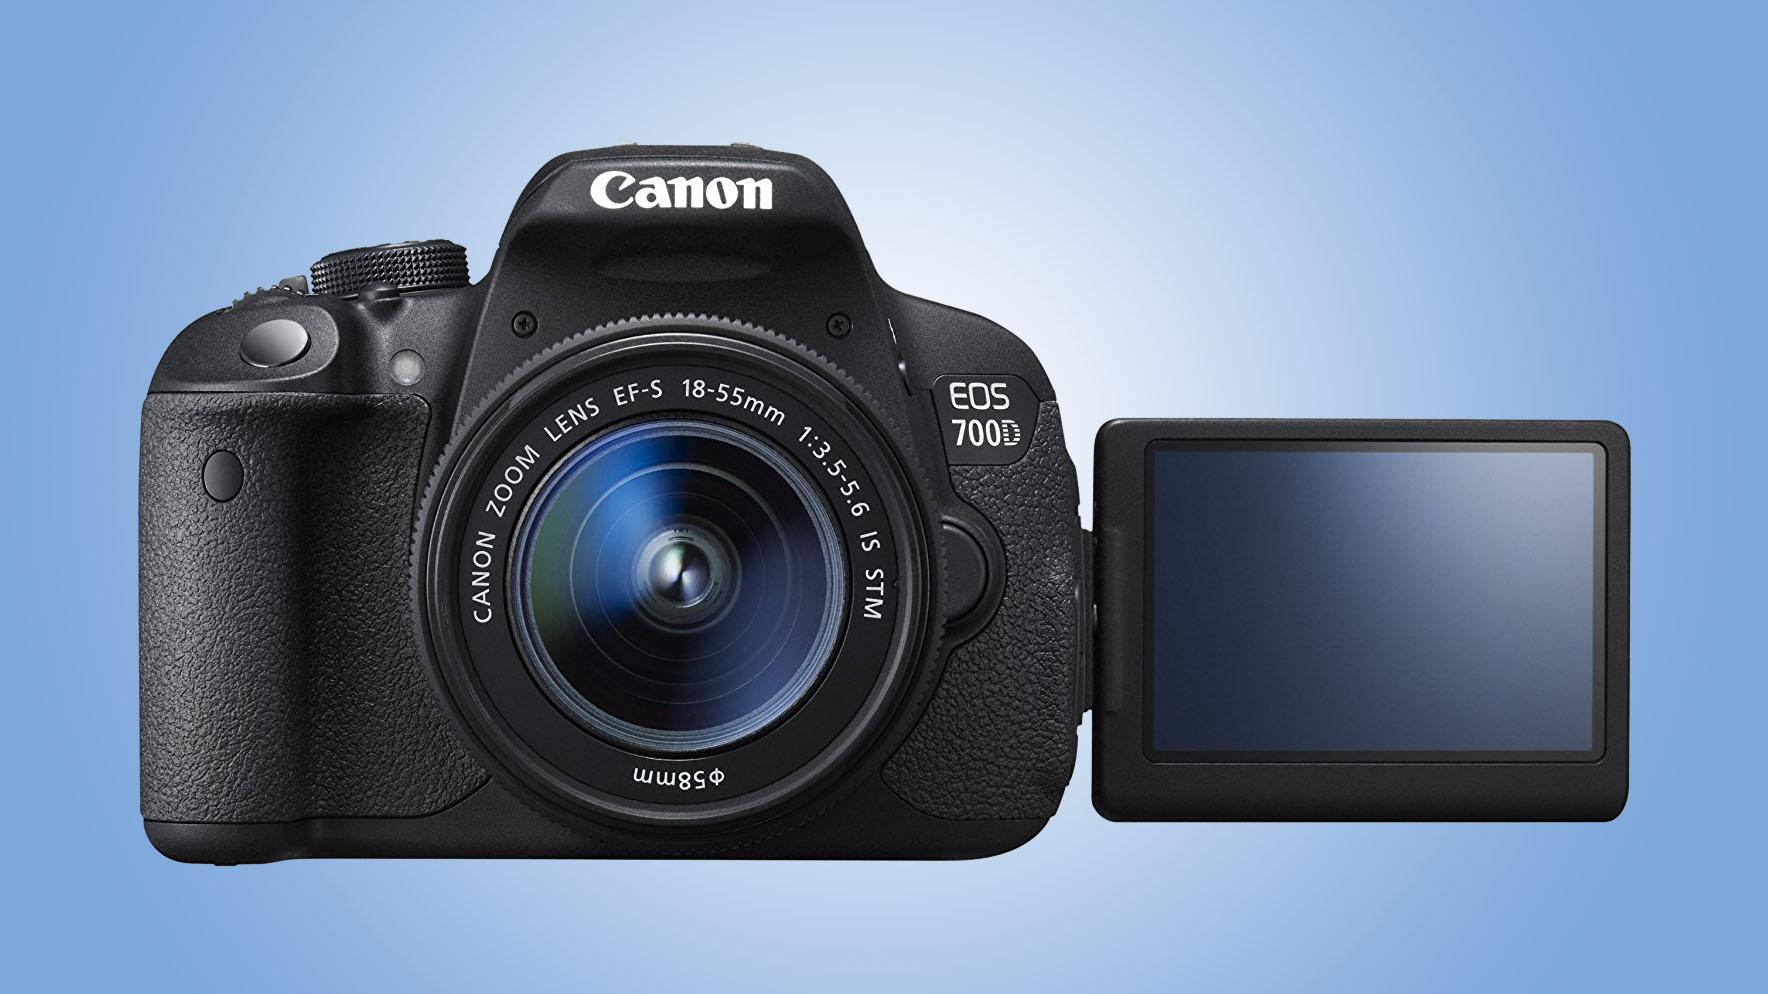 Canon EOS Rebel T5i / EOS 700D